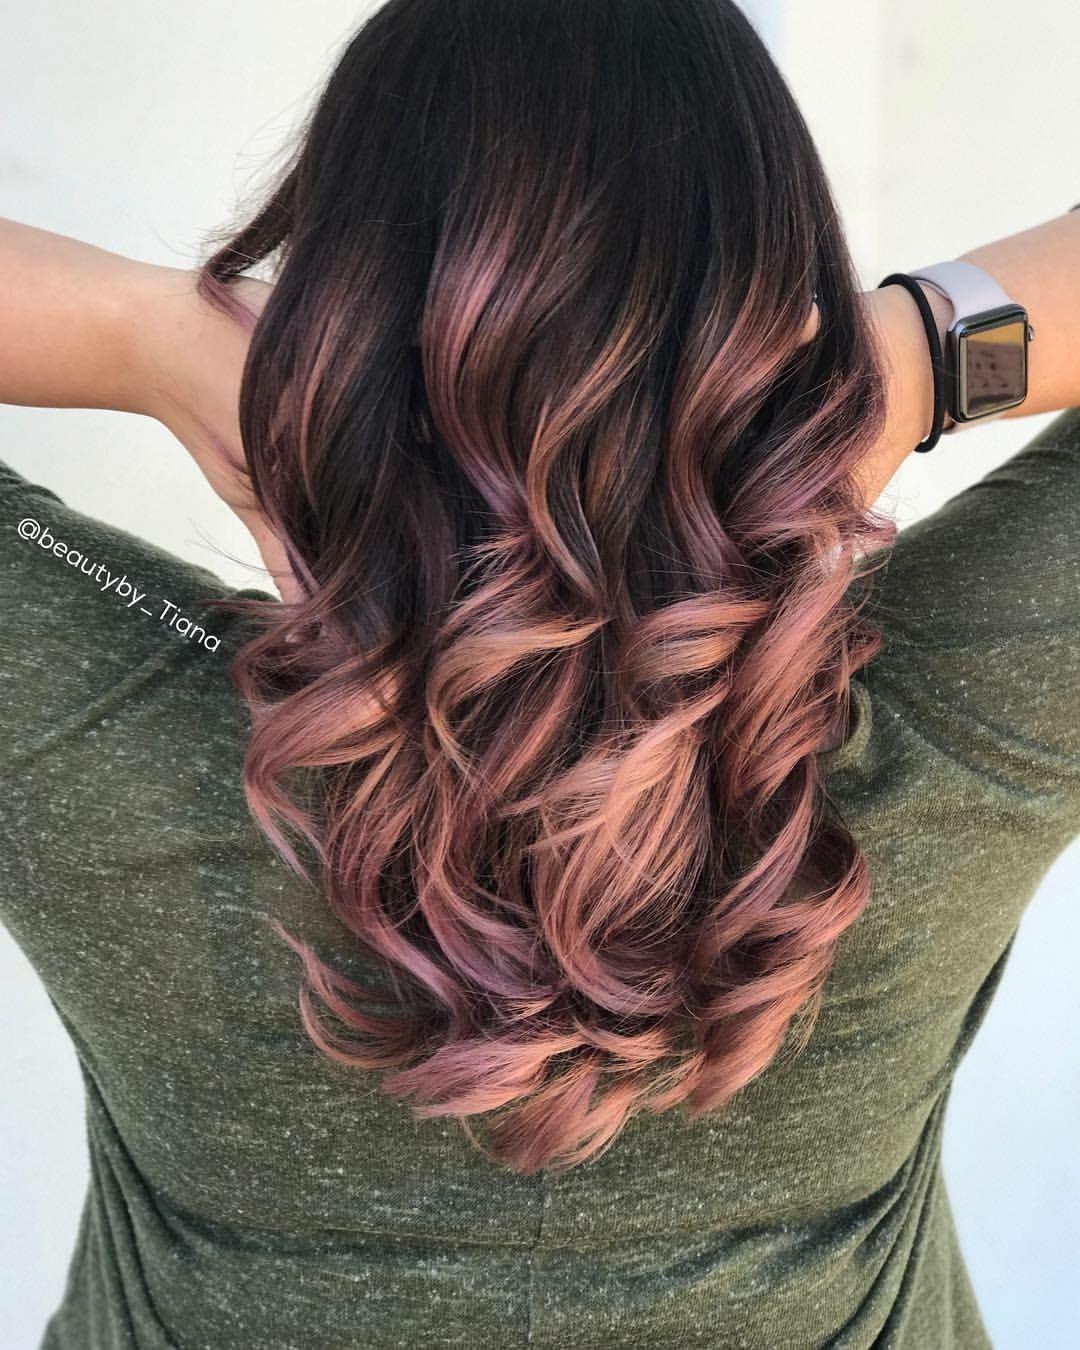 Rose Gold Balayage Hair @beautyby_tiana @brittainyjade in